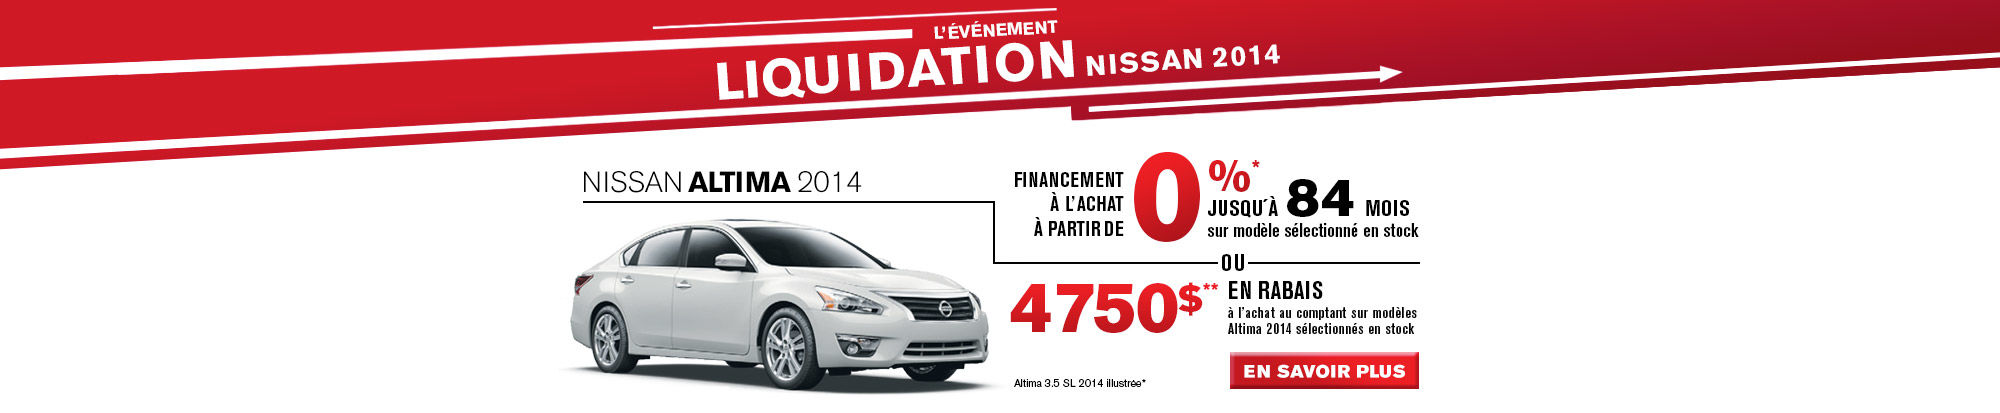 LIQUIDATION NISSAN 2014